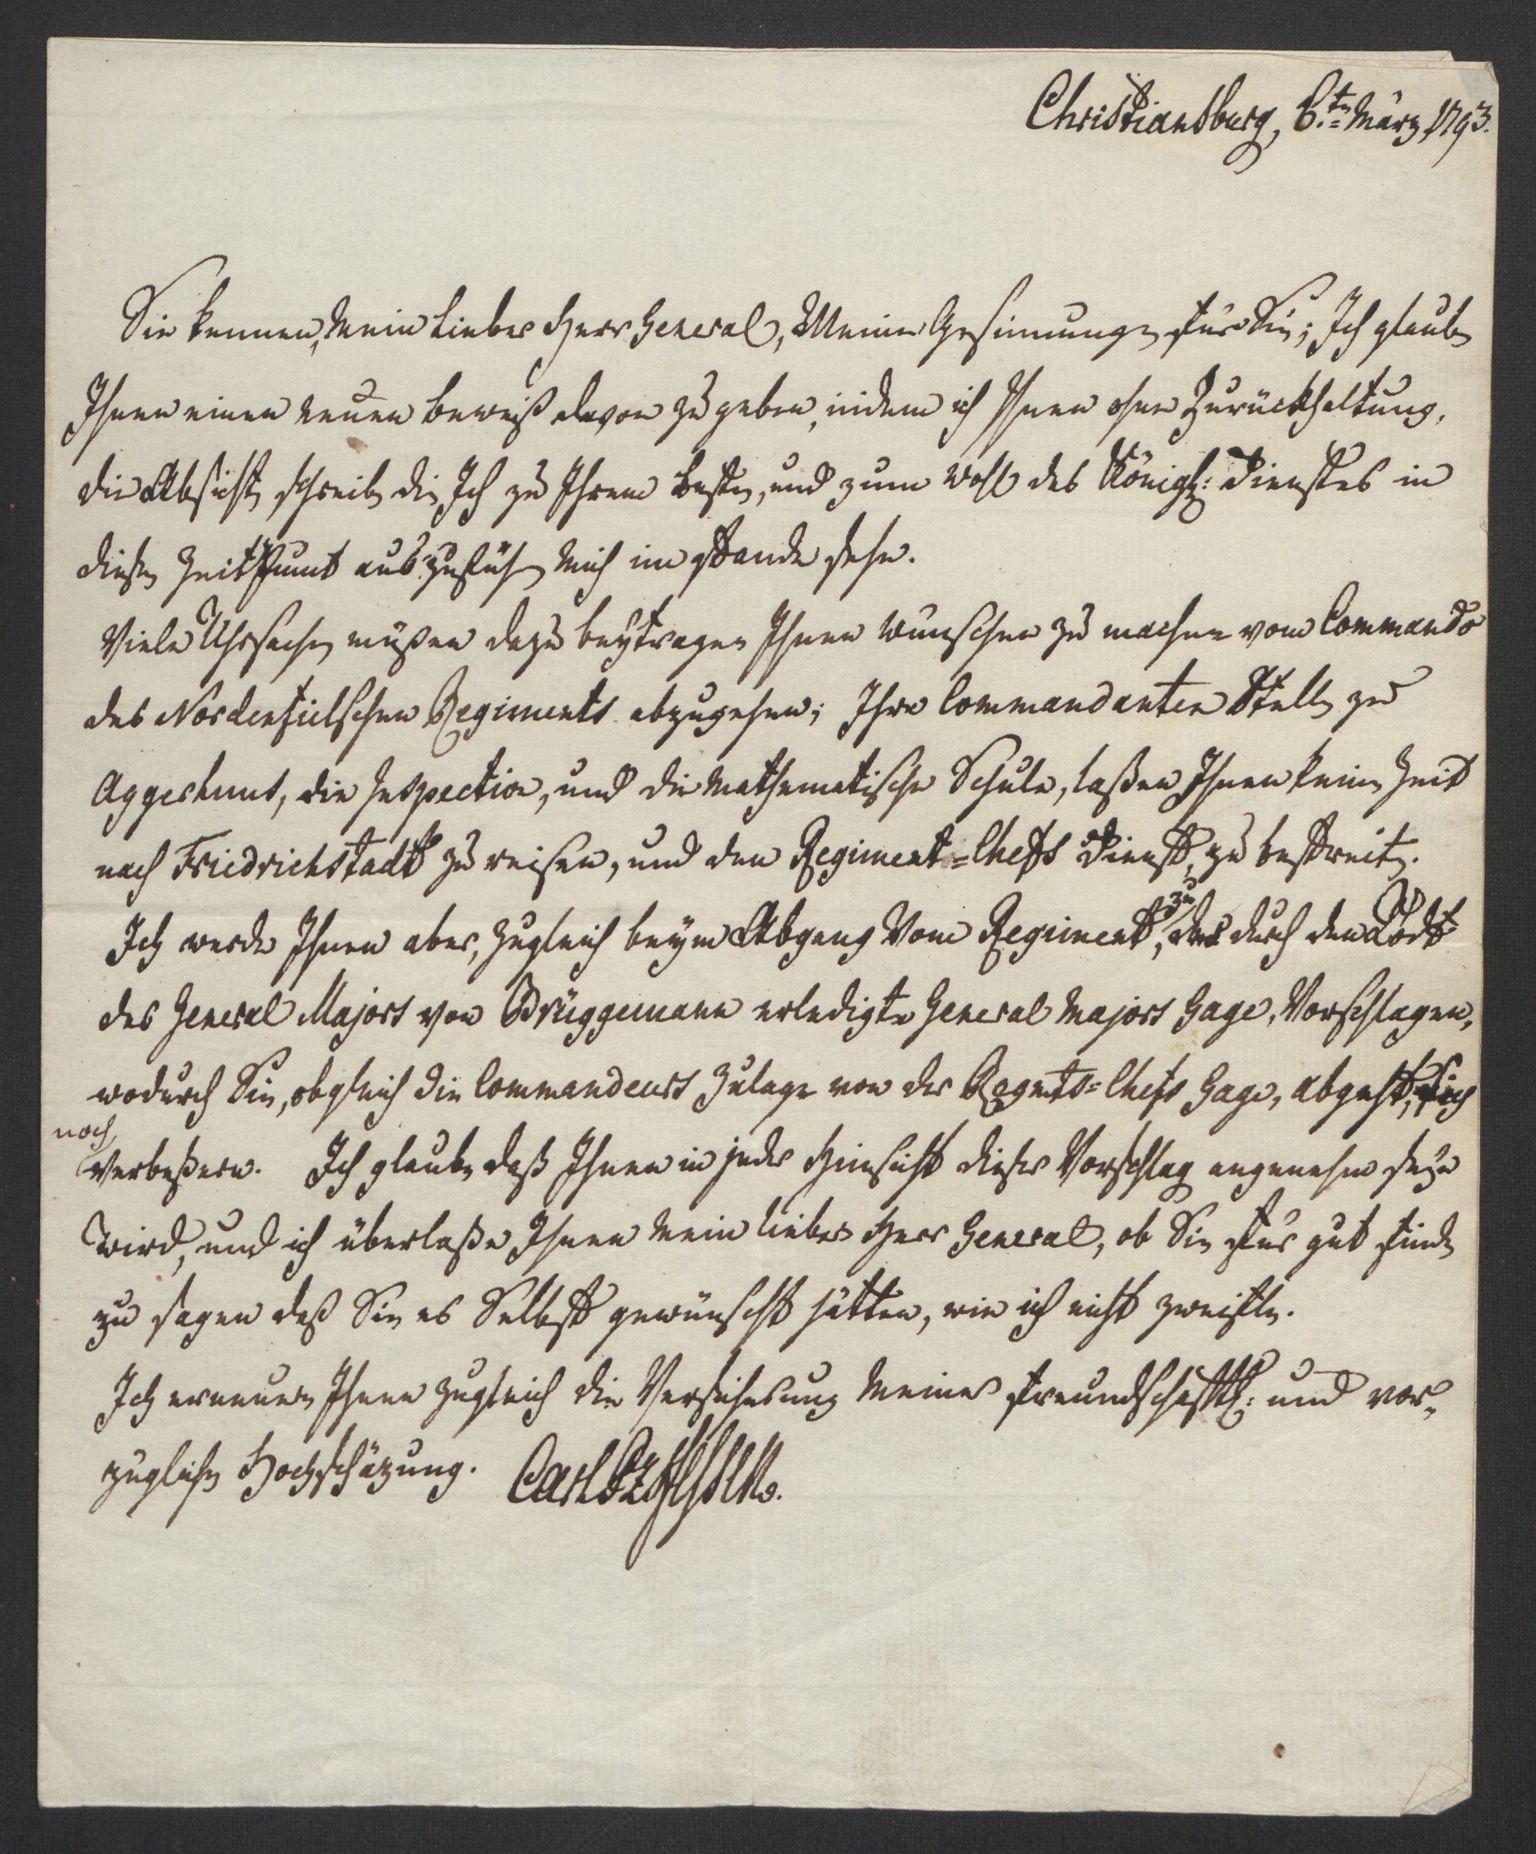 RA, Hesselberg, Hans Jacob Henning, F/L0001: --, 1759-1809, s. 81